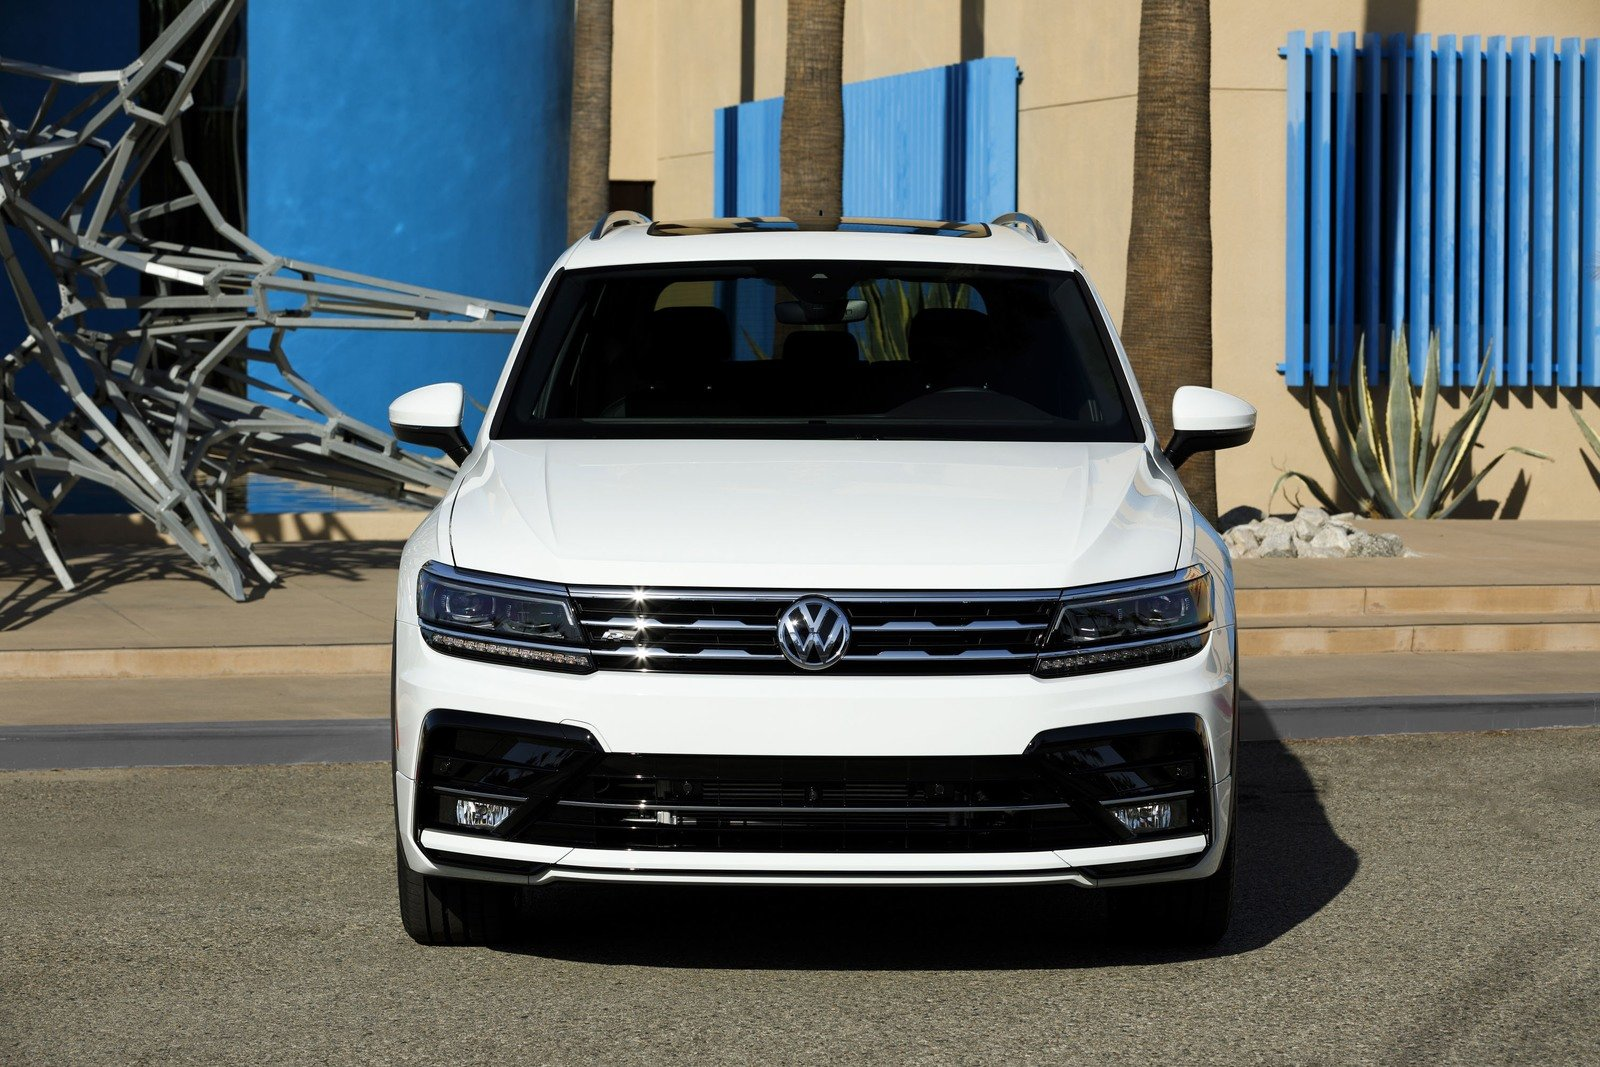 volkswagen unveils the tiguan 2018 r-line sports version Volkswagen unveils the Tiguan 2018 R-Line sports version  D9 88 D8 A7 D8 AC D9 87 D8 A9  D9 81 D9 88 D9 84 D9 83 D8 B3  D9 88 D8 A7 D8 AC D9 86  D8 AA D9 8A D8 AC D9 88 D8 A7 D9 86 R Line 2018